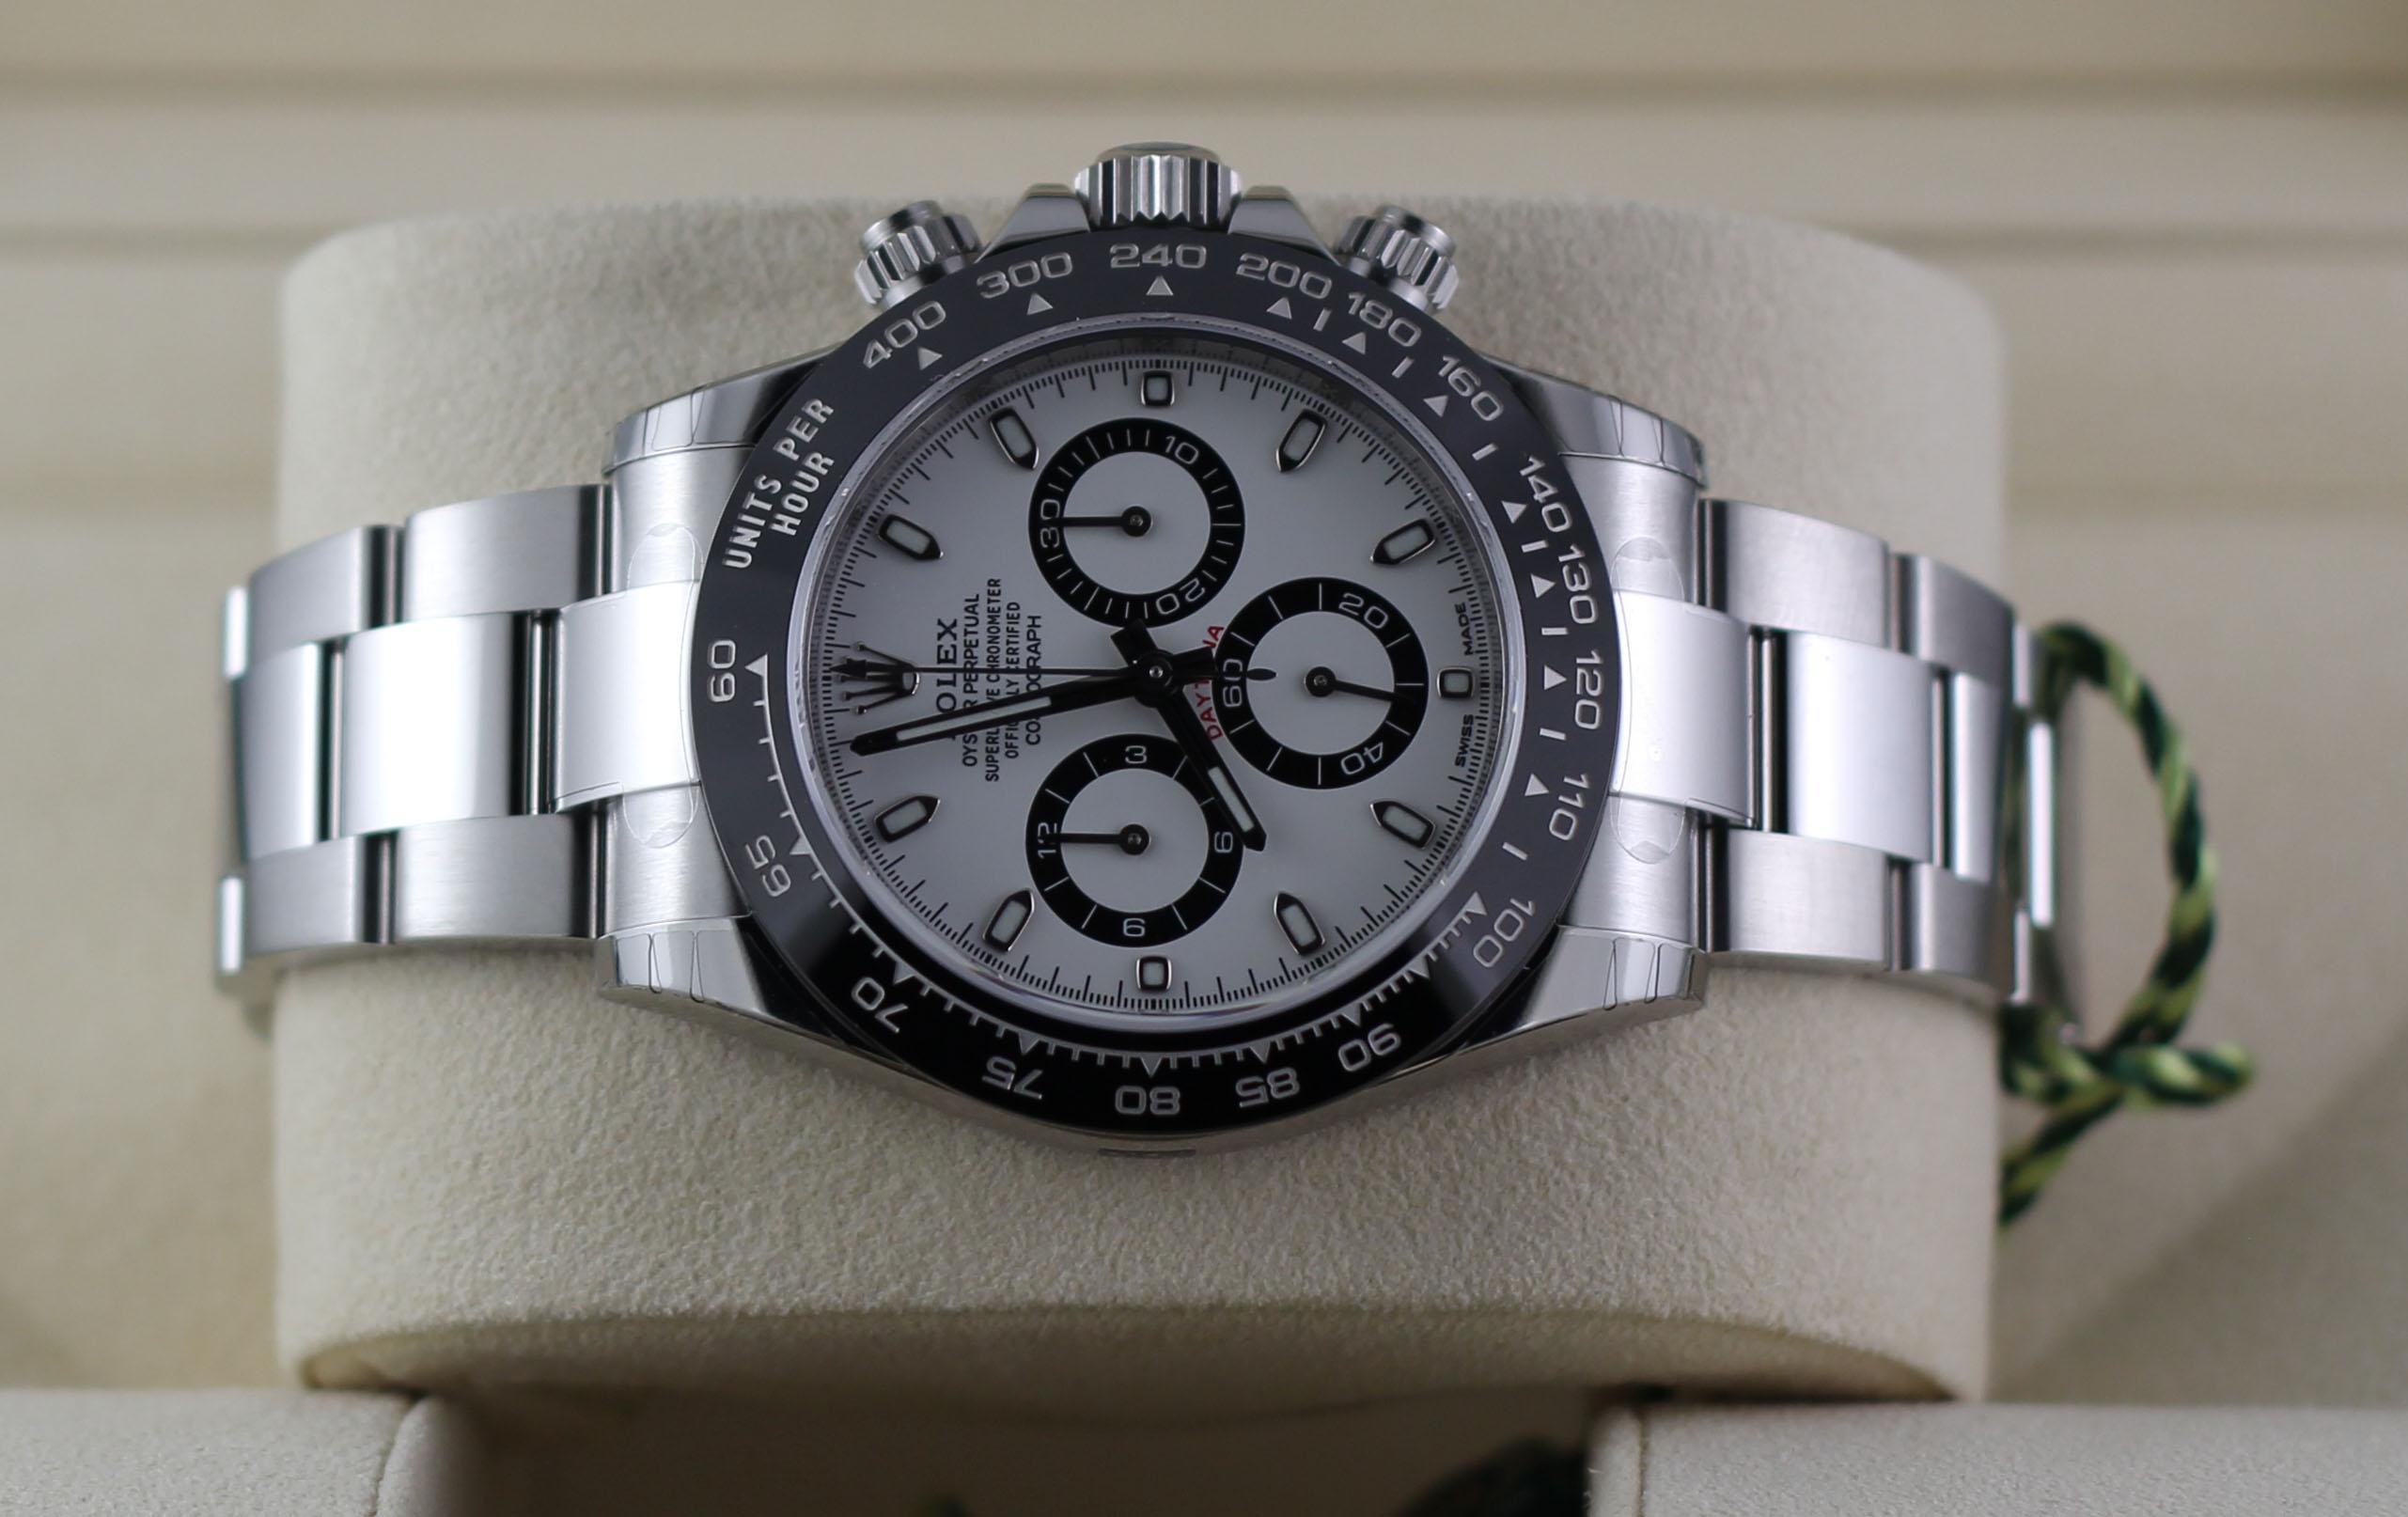 rolex daytona 116500 ceramic white vip chrono watches. Black Bedroom Furniture Sets. Home Design Ideas